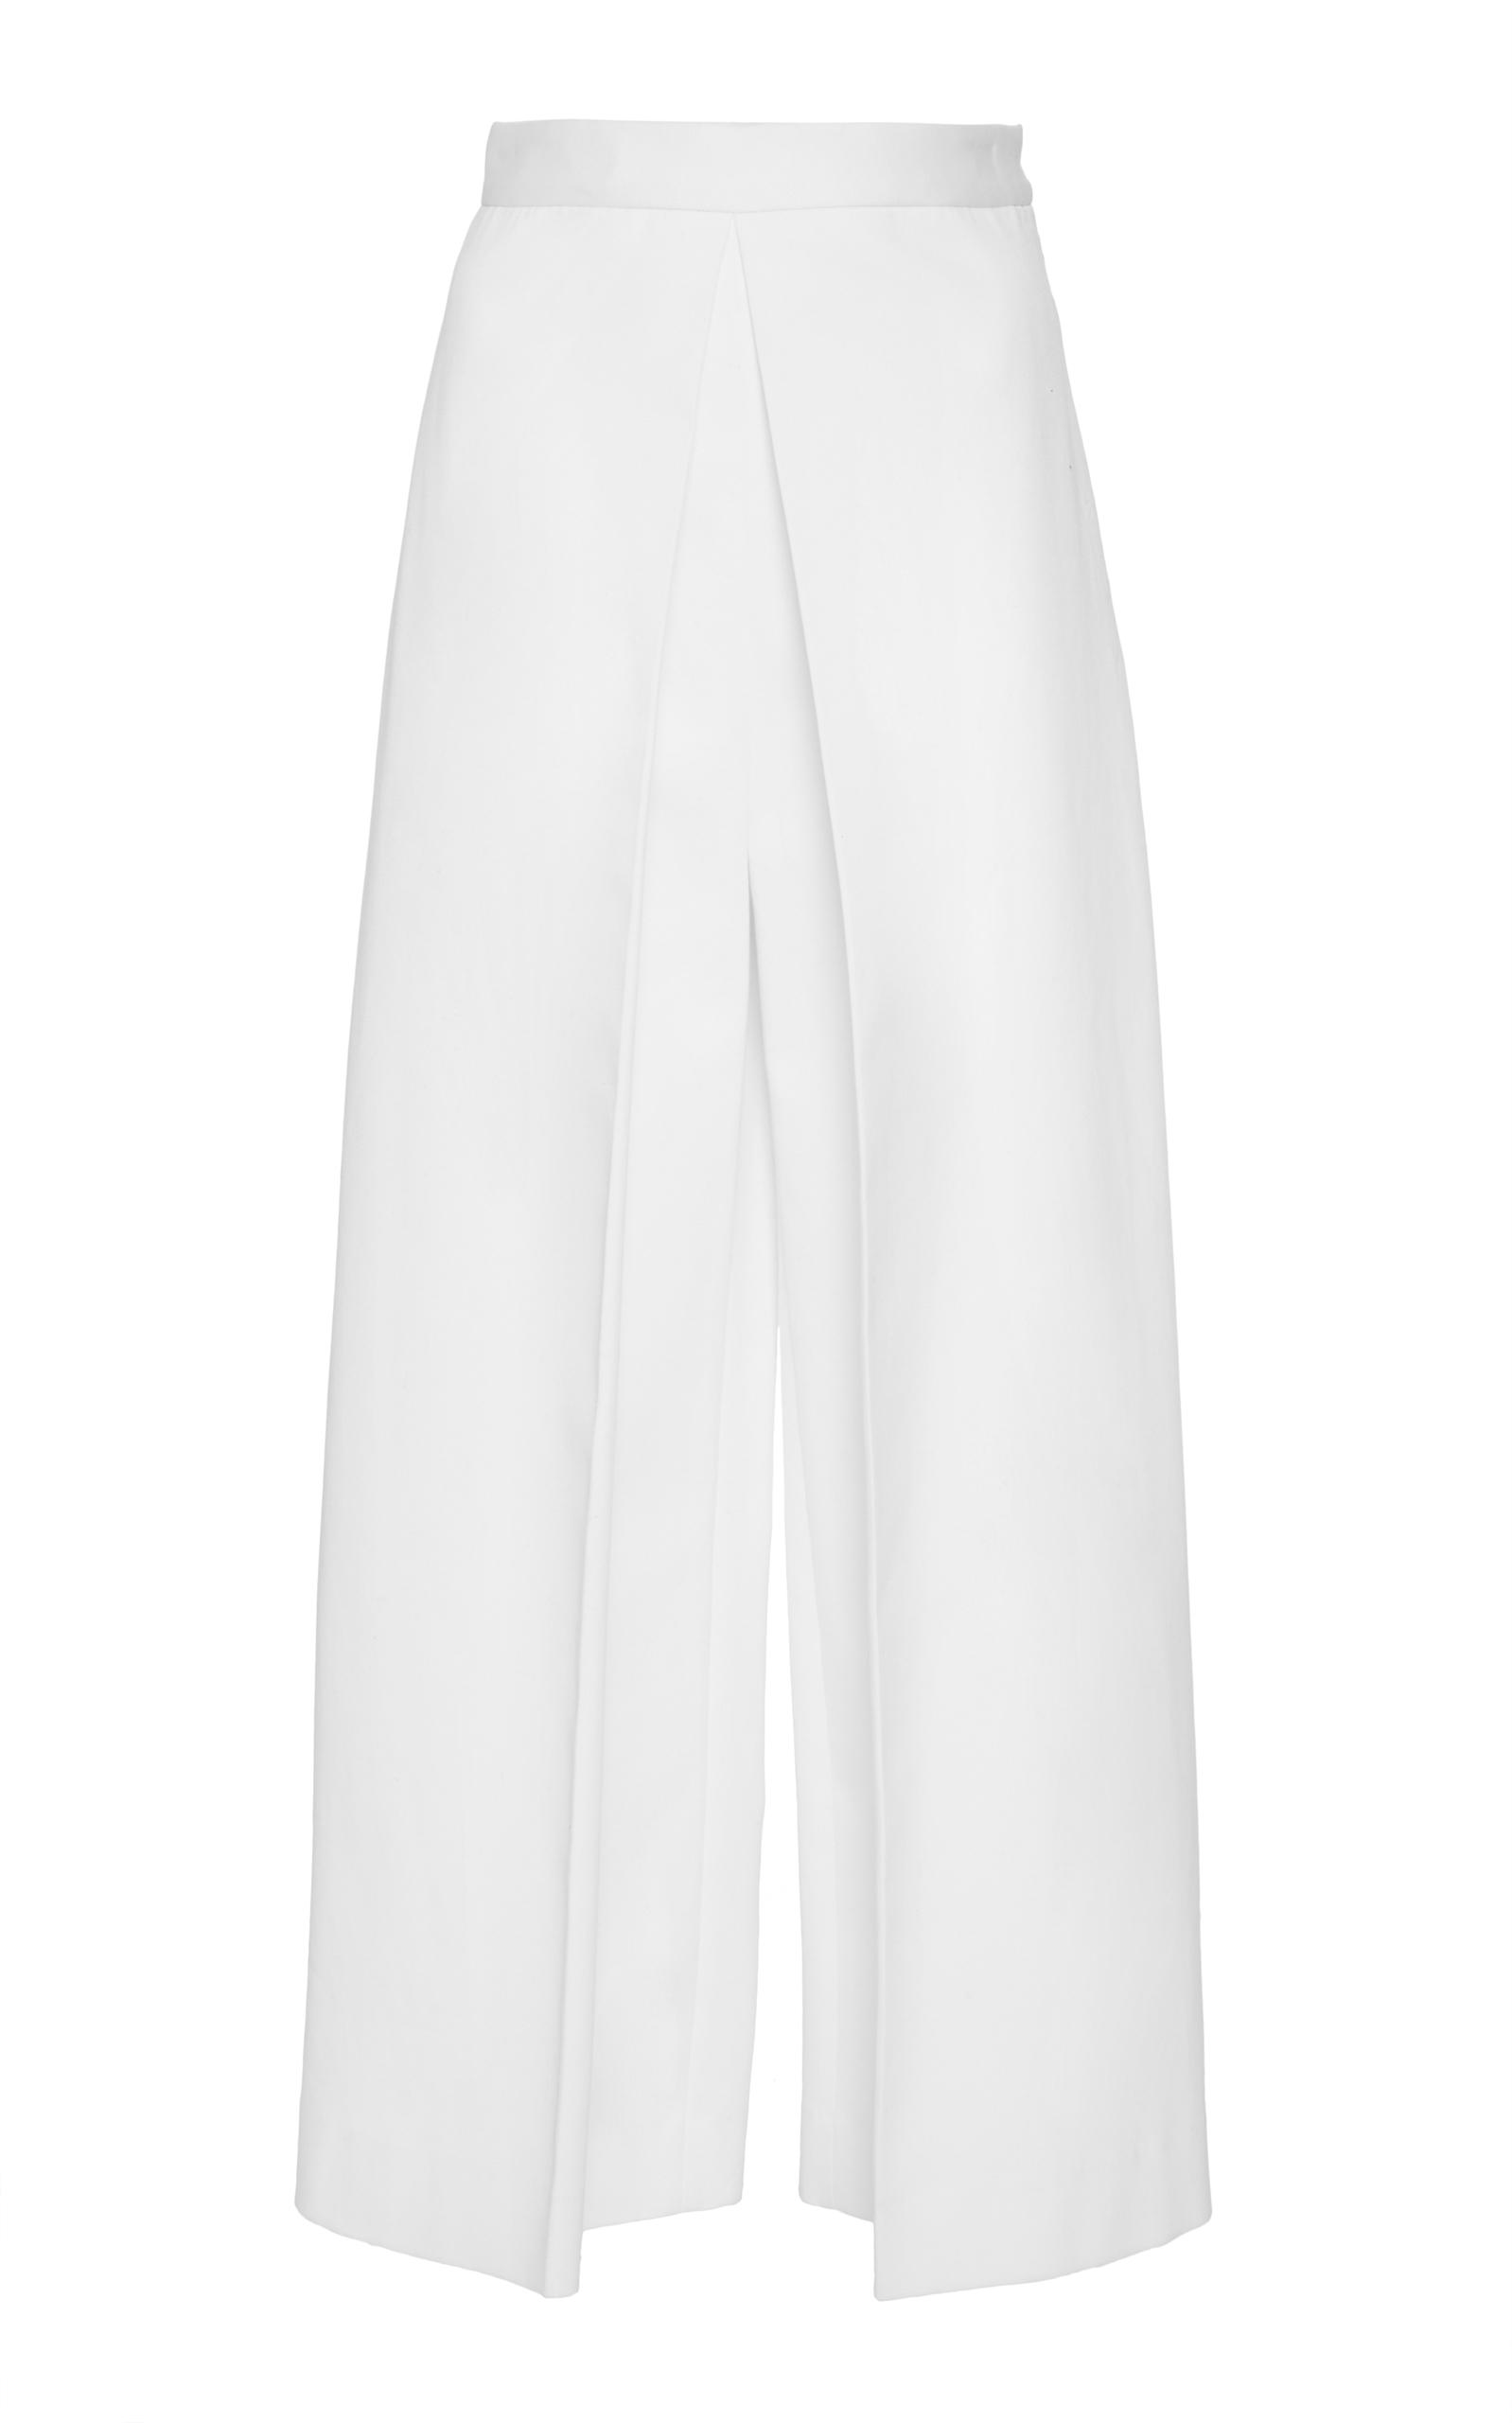 ROSETTA GETTY Pleat-Front Stretch-Ottoman Culottes in White